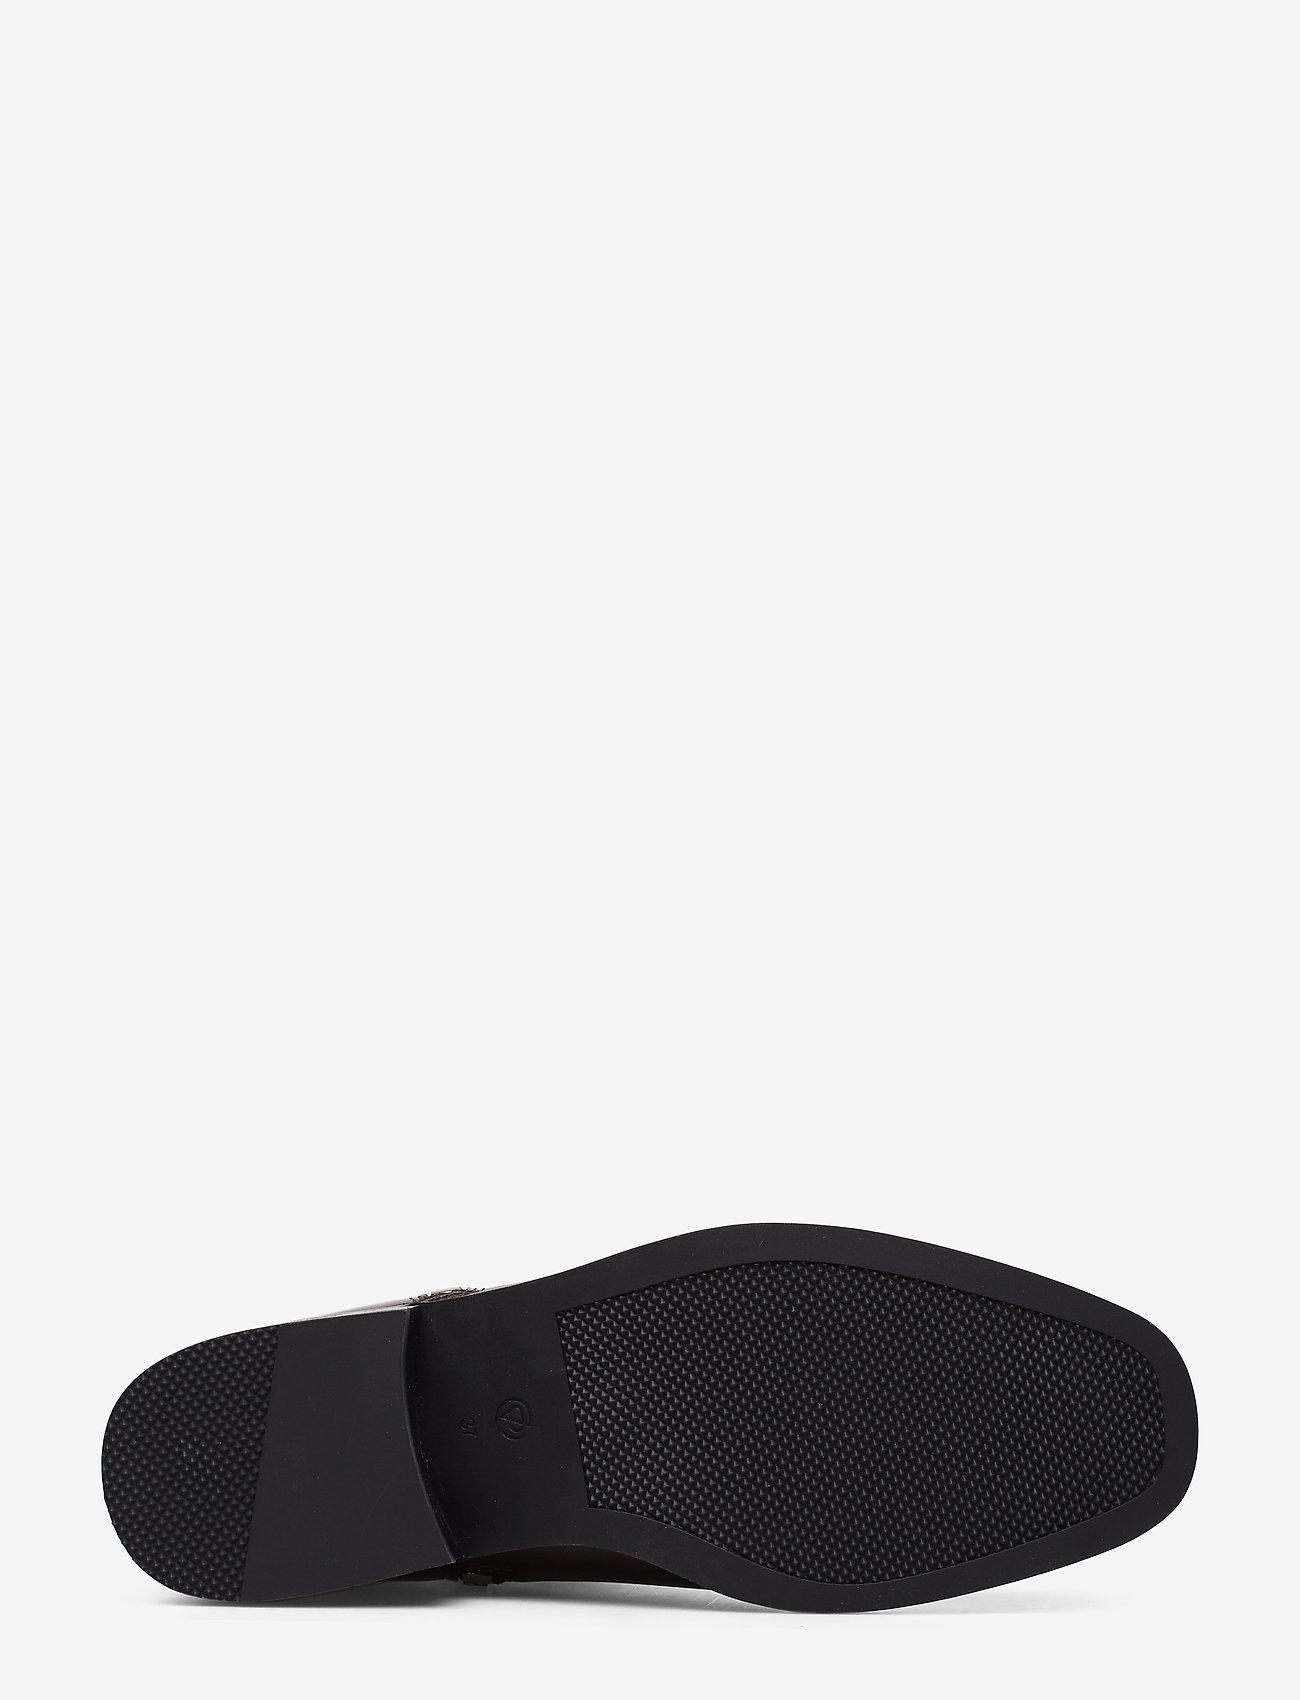 Alexa - 40mm Boot (Chocolate) - 3.1 Phillip Lim